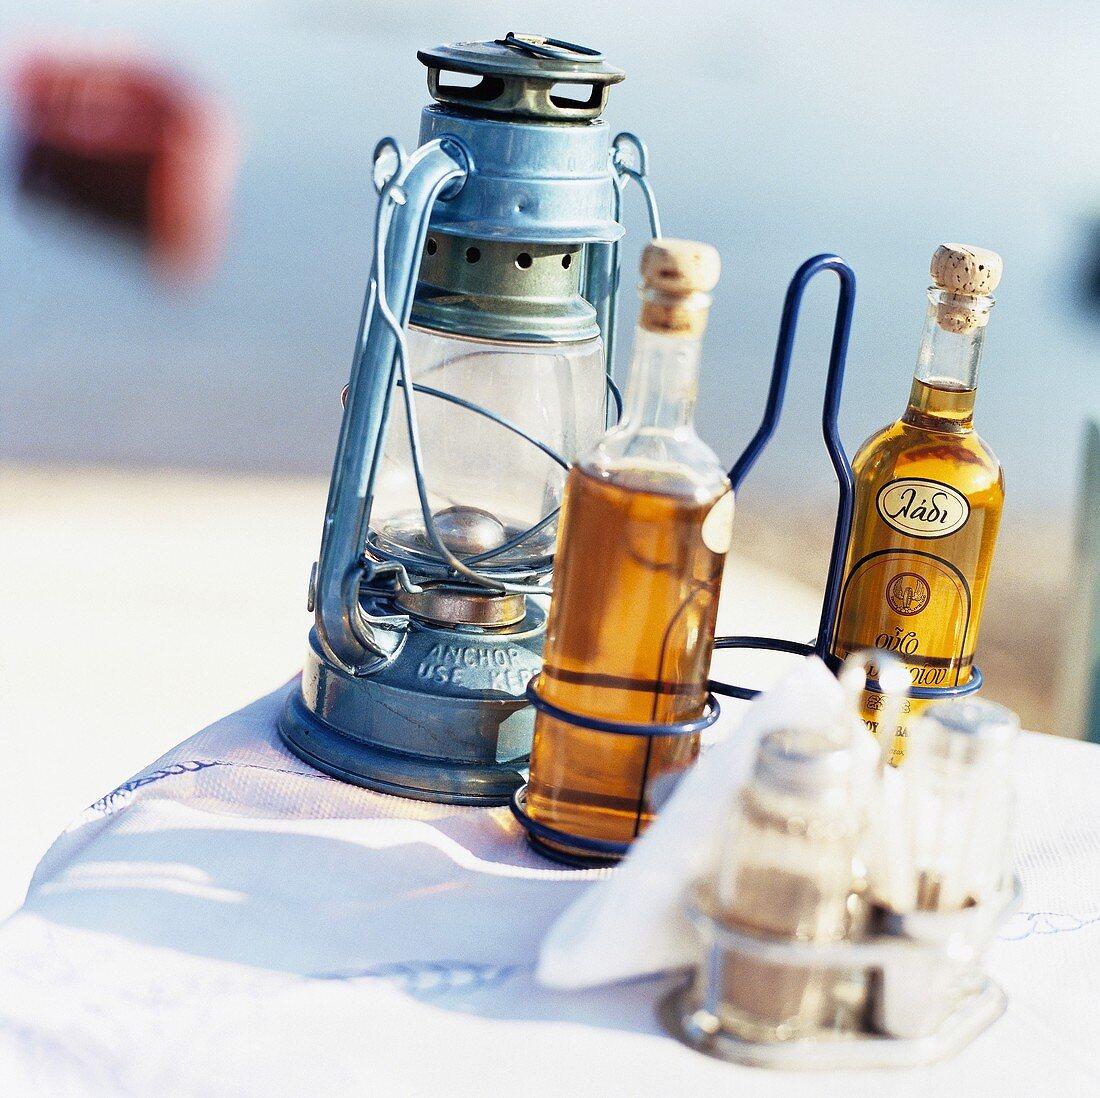 Cruet stand, oil, vinegar & hurricane lamp on table out of doors